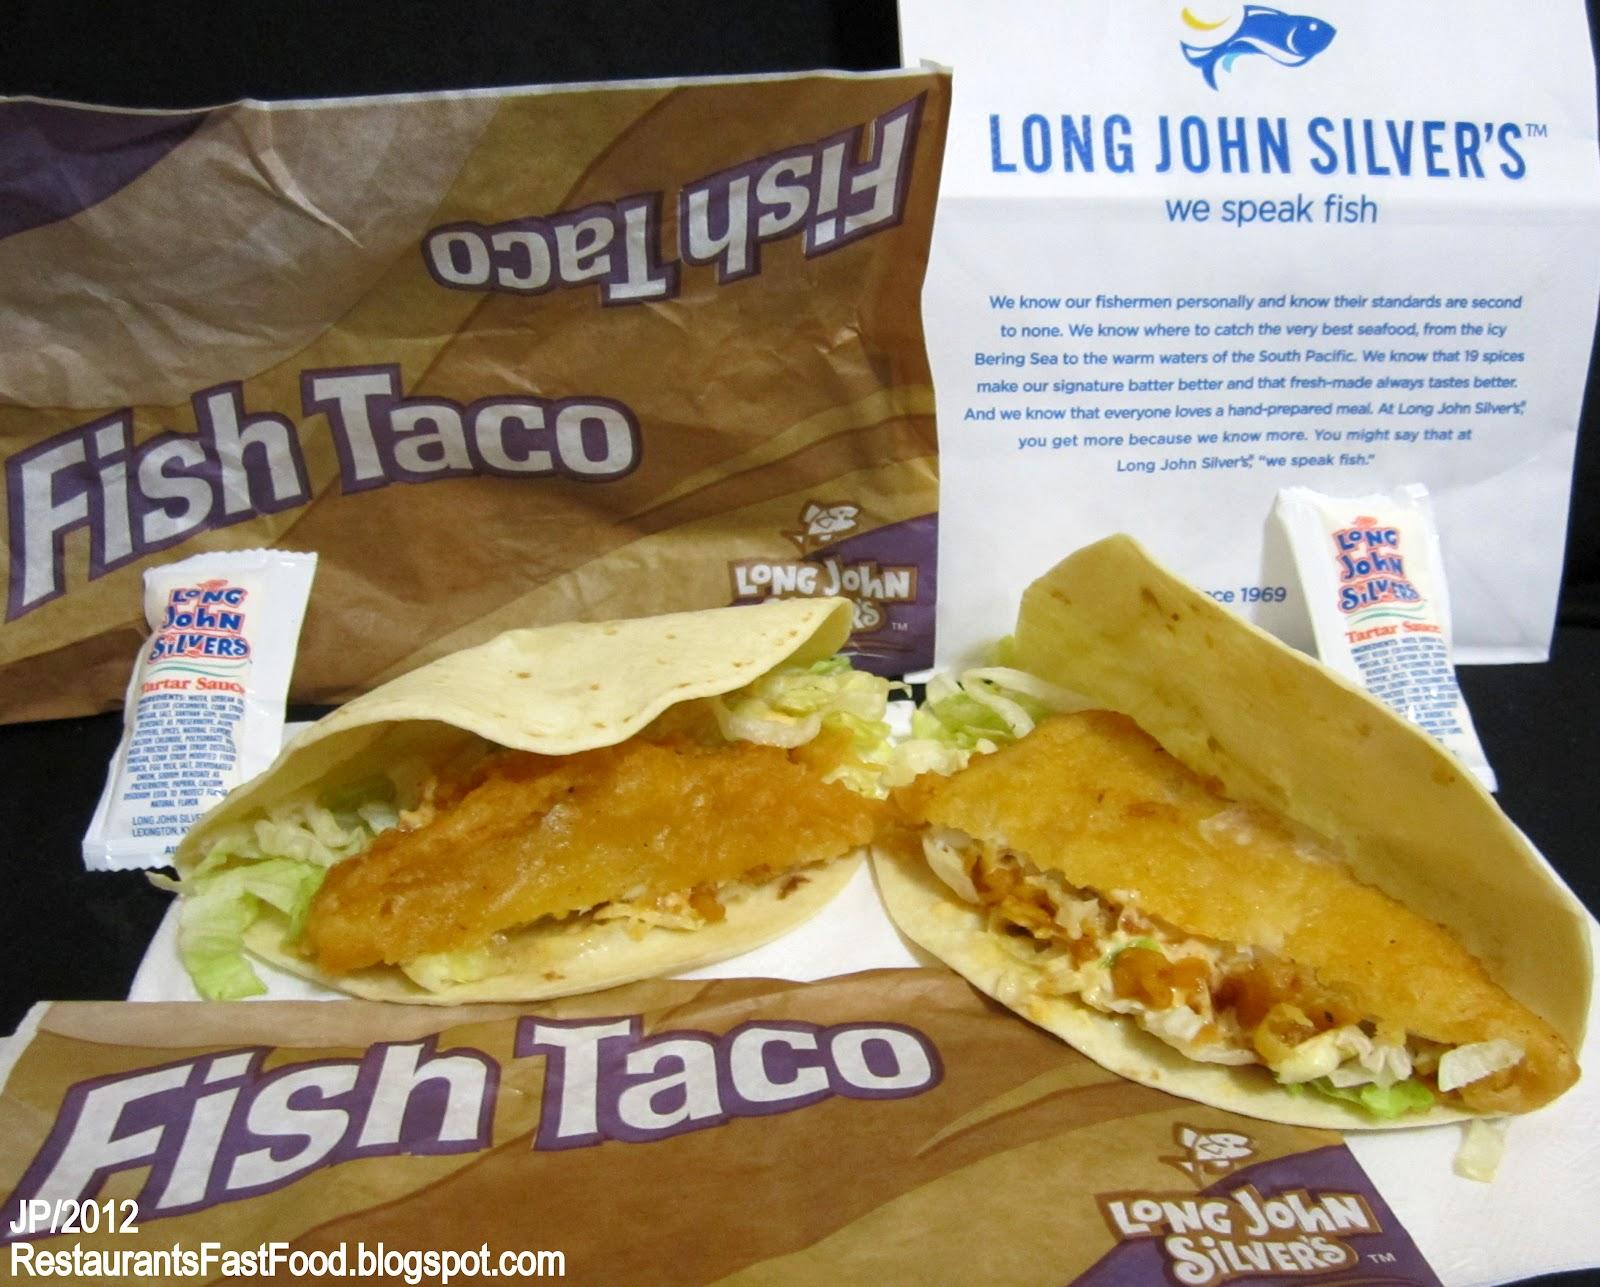 Long John Silvers Salt Lake City Utah Fast Food Fish Seafood Restaurant 36 S State St 301 Ut 84111 Slc